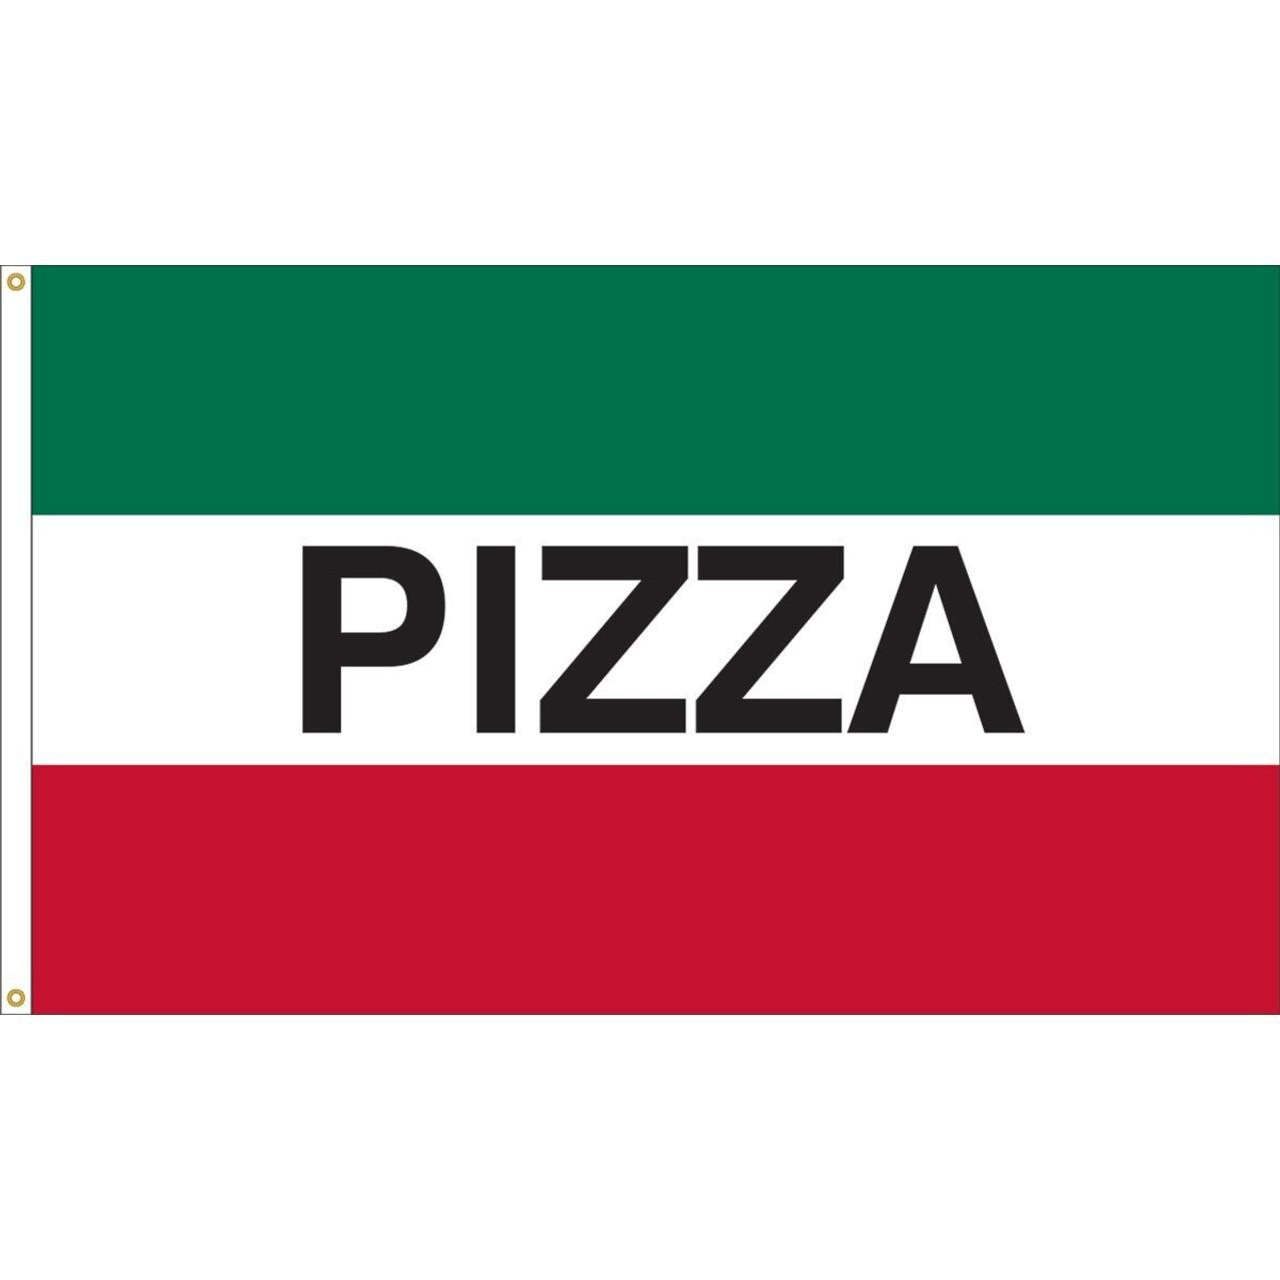 Pizza Flag